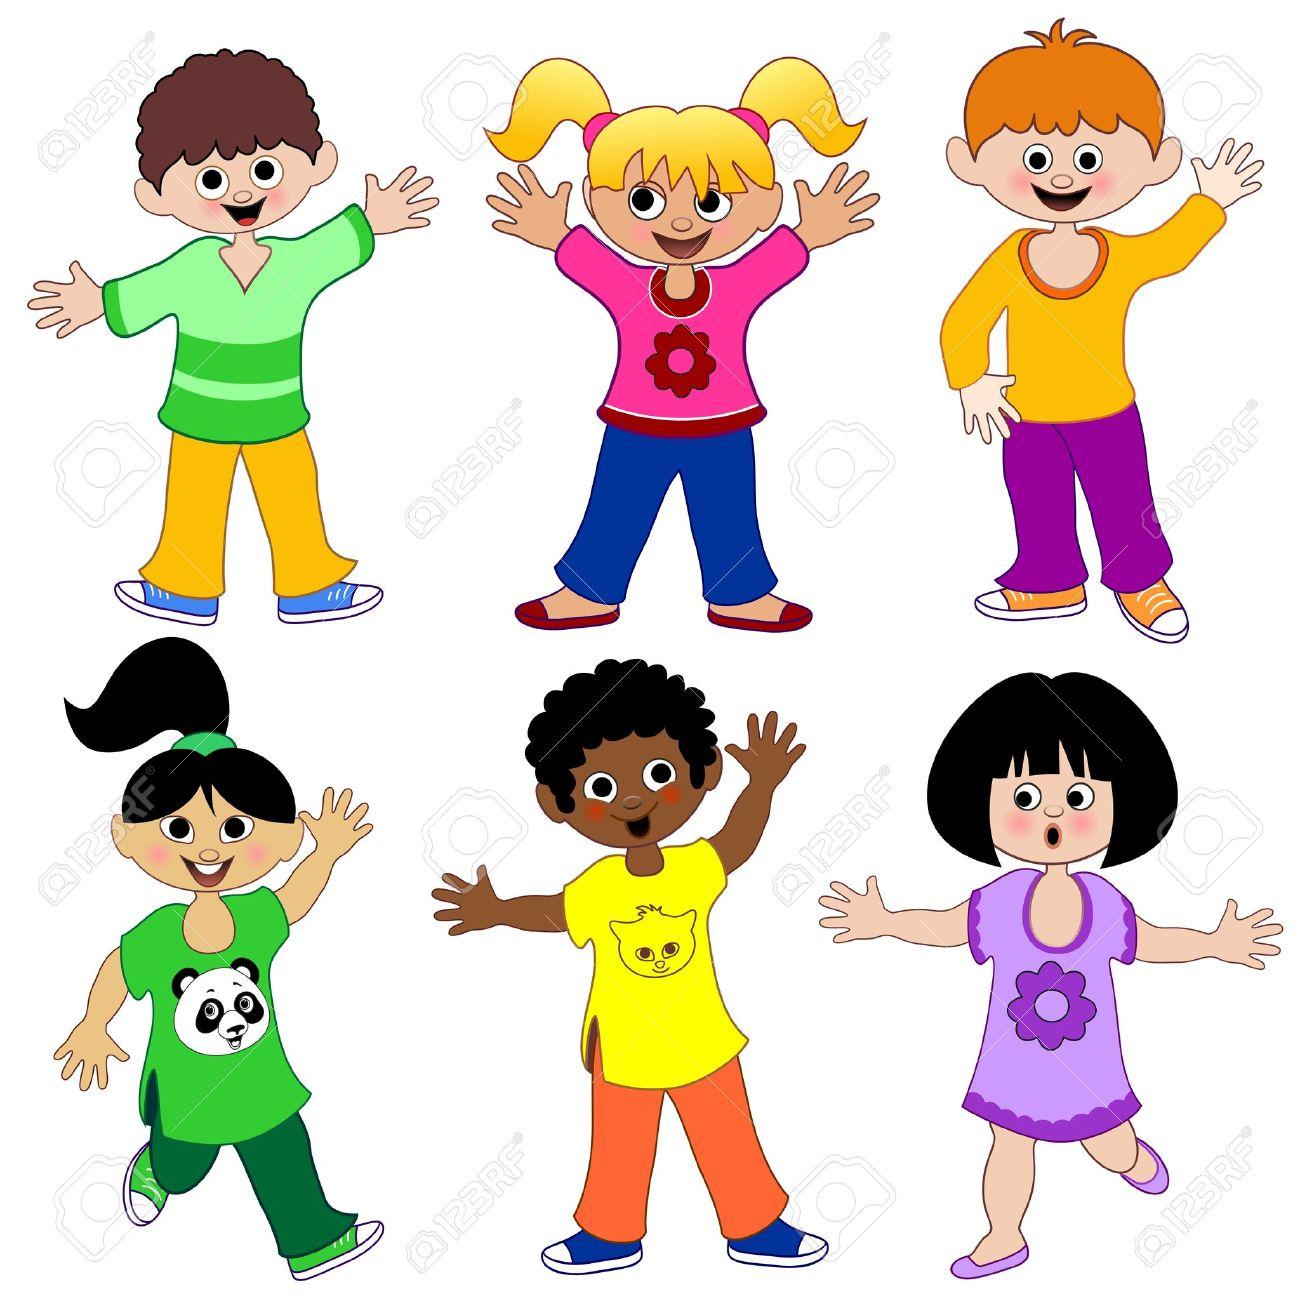 Children Kids From The World Stock Vector - 10509129